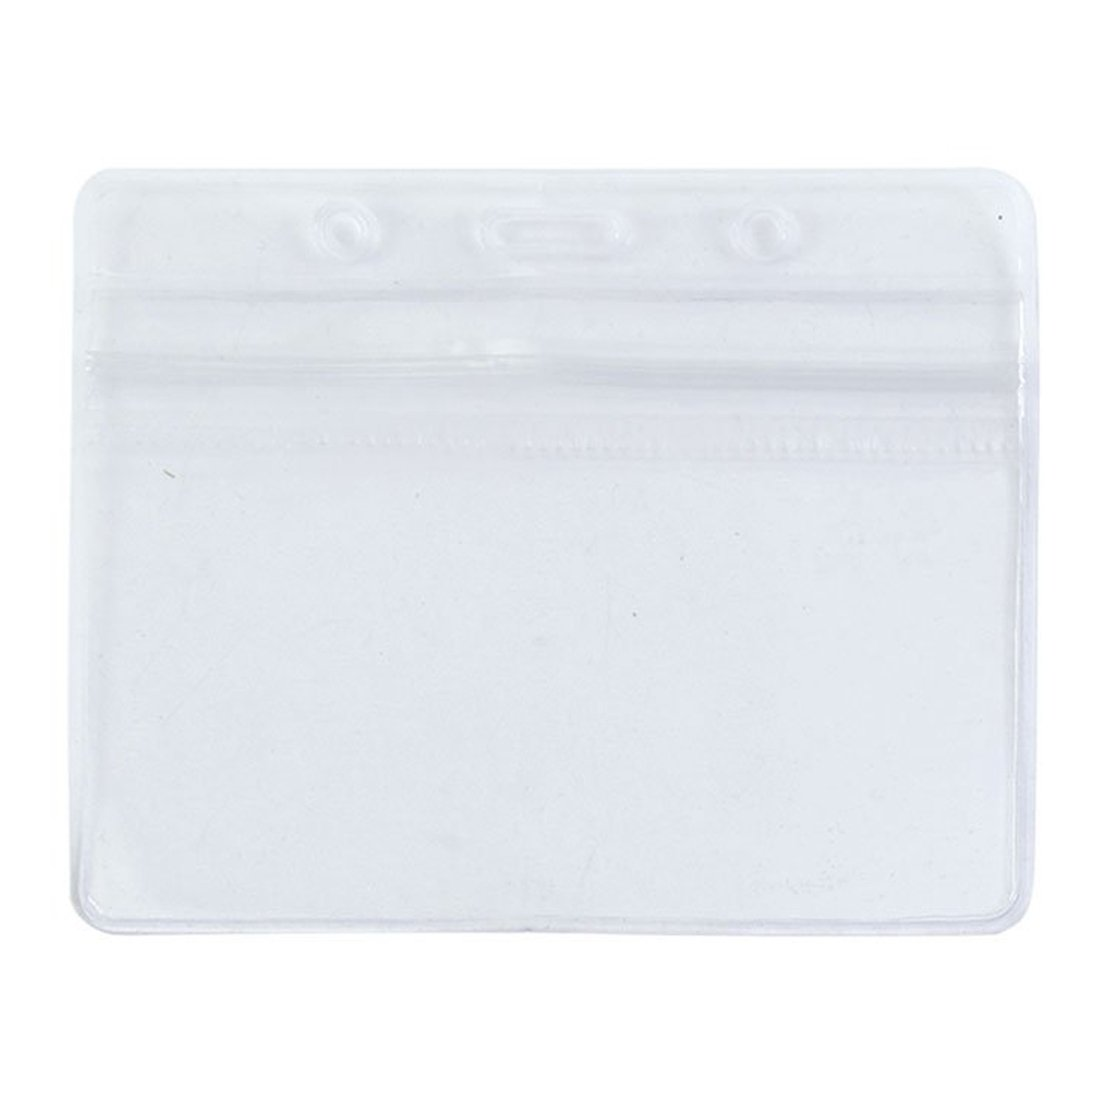 REFURBISHHOUSE 2 x Funda de PVC transparente Impermeable Exposicion horizontal para Tarjeta de identificacion Funda de tarjeta Insignia